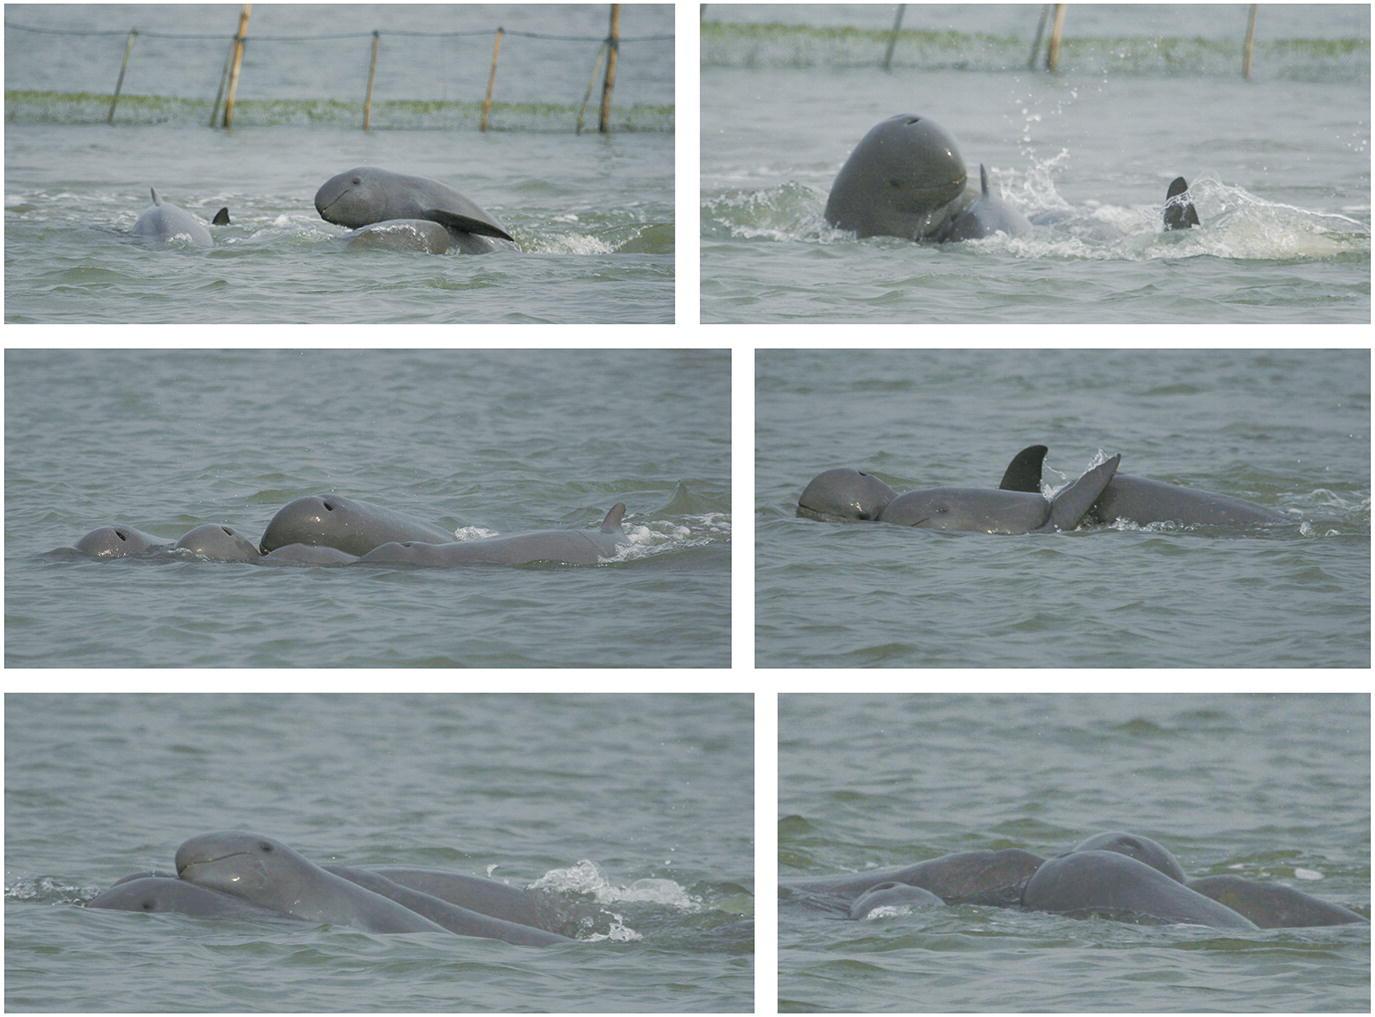 Cetacean Sociality in Rivers, Lagoons, and Estuaries